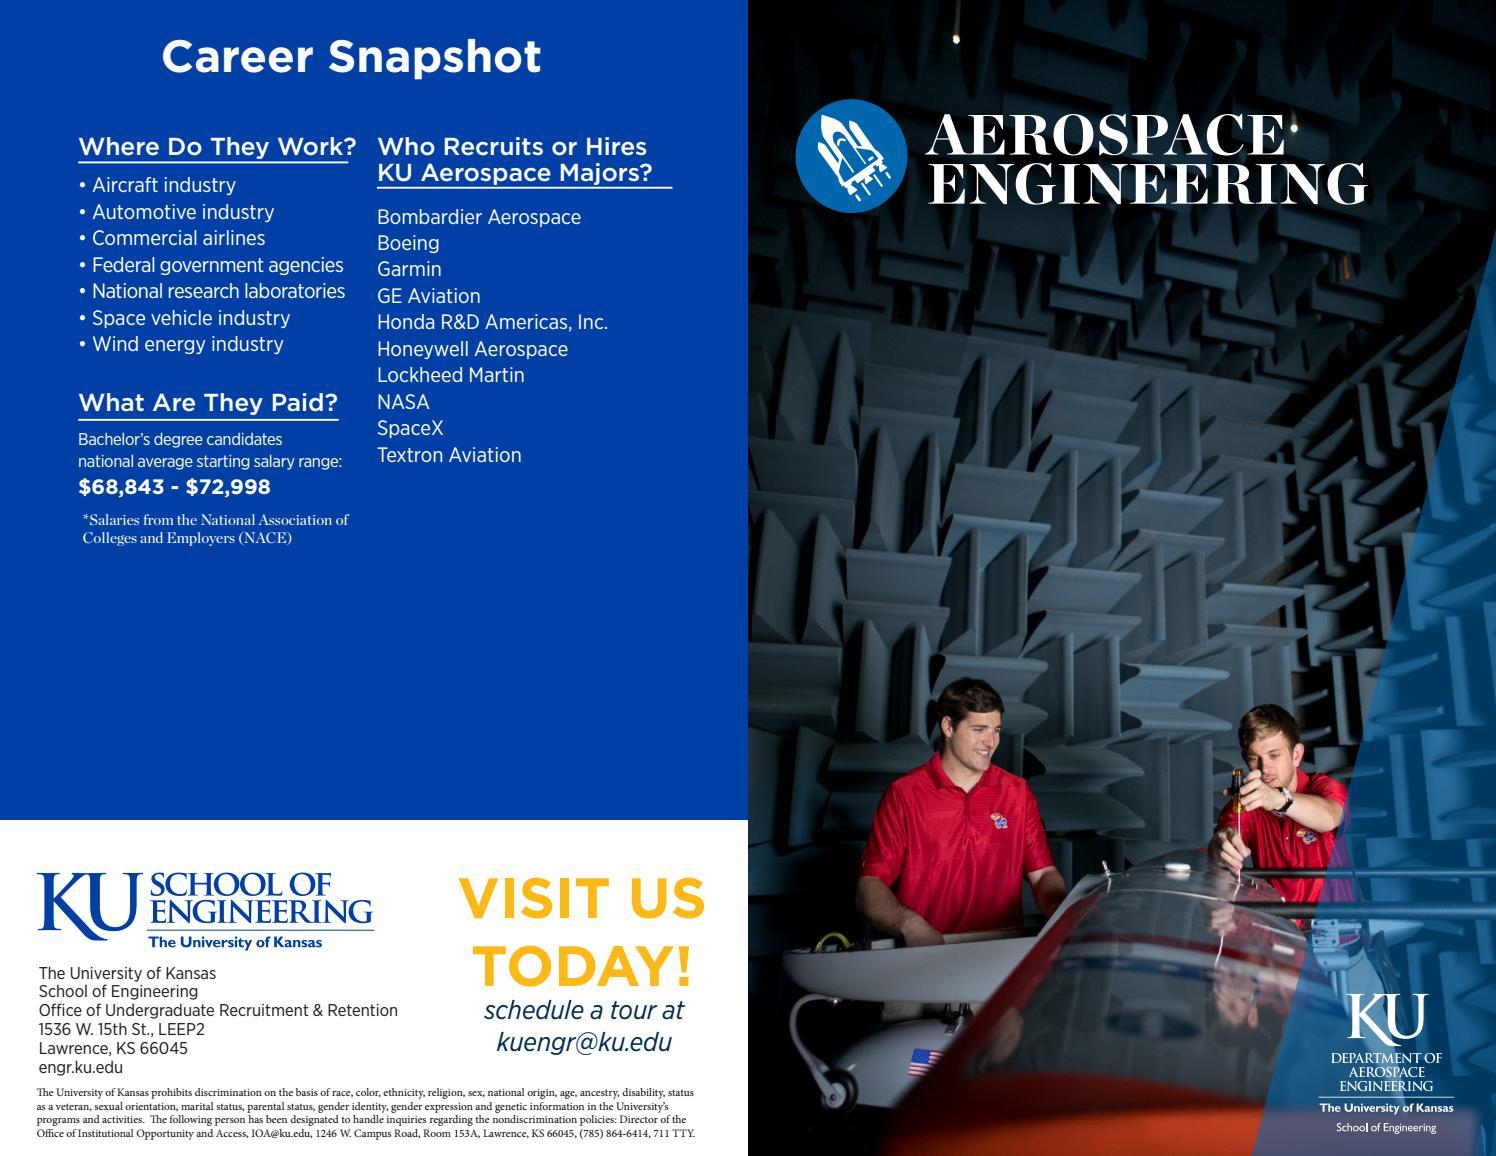 Ku engineering aerospace engineering guide(2017 2018) by KU